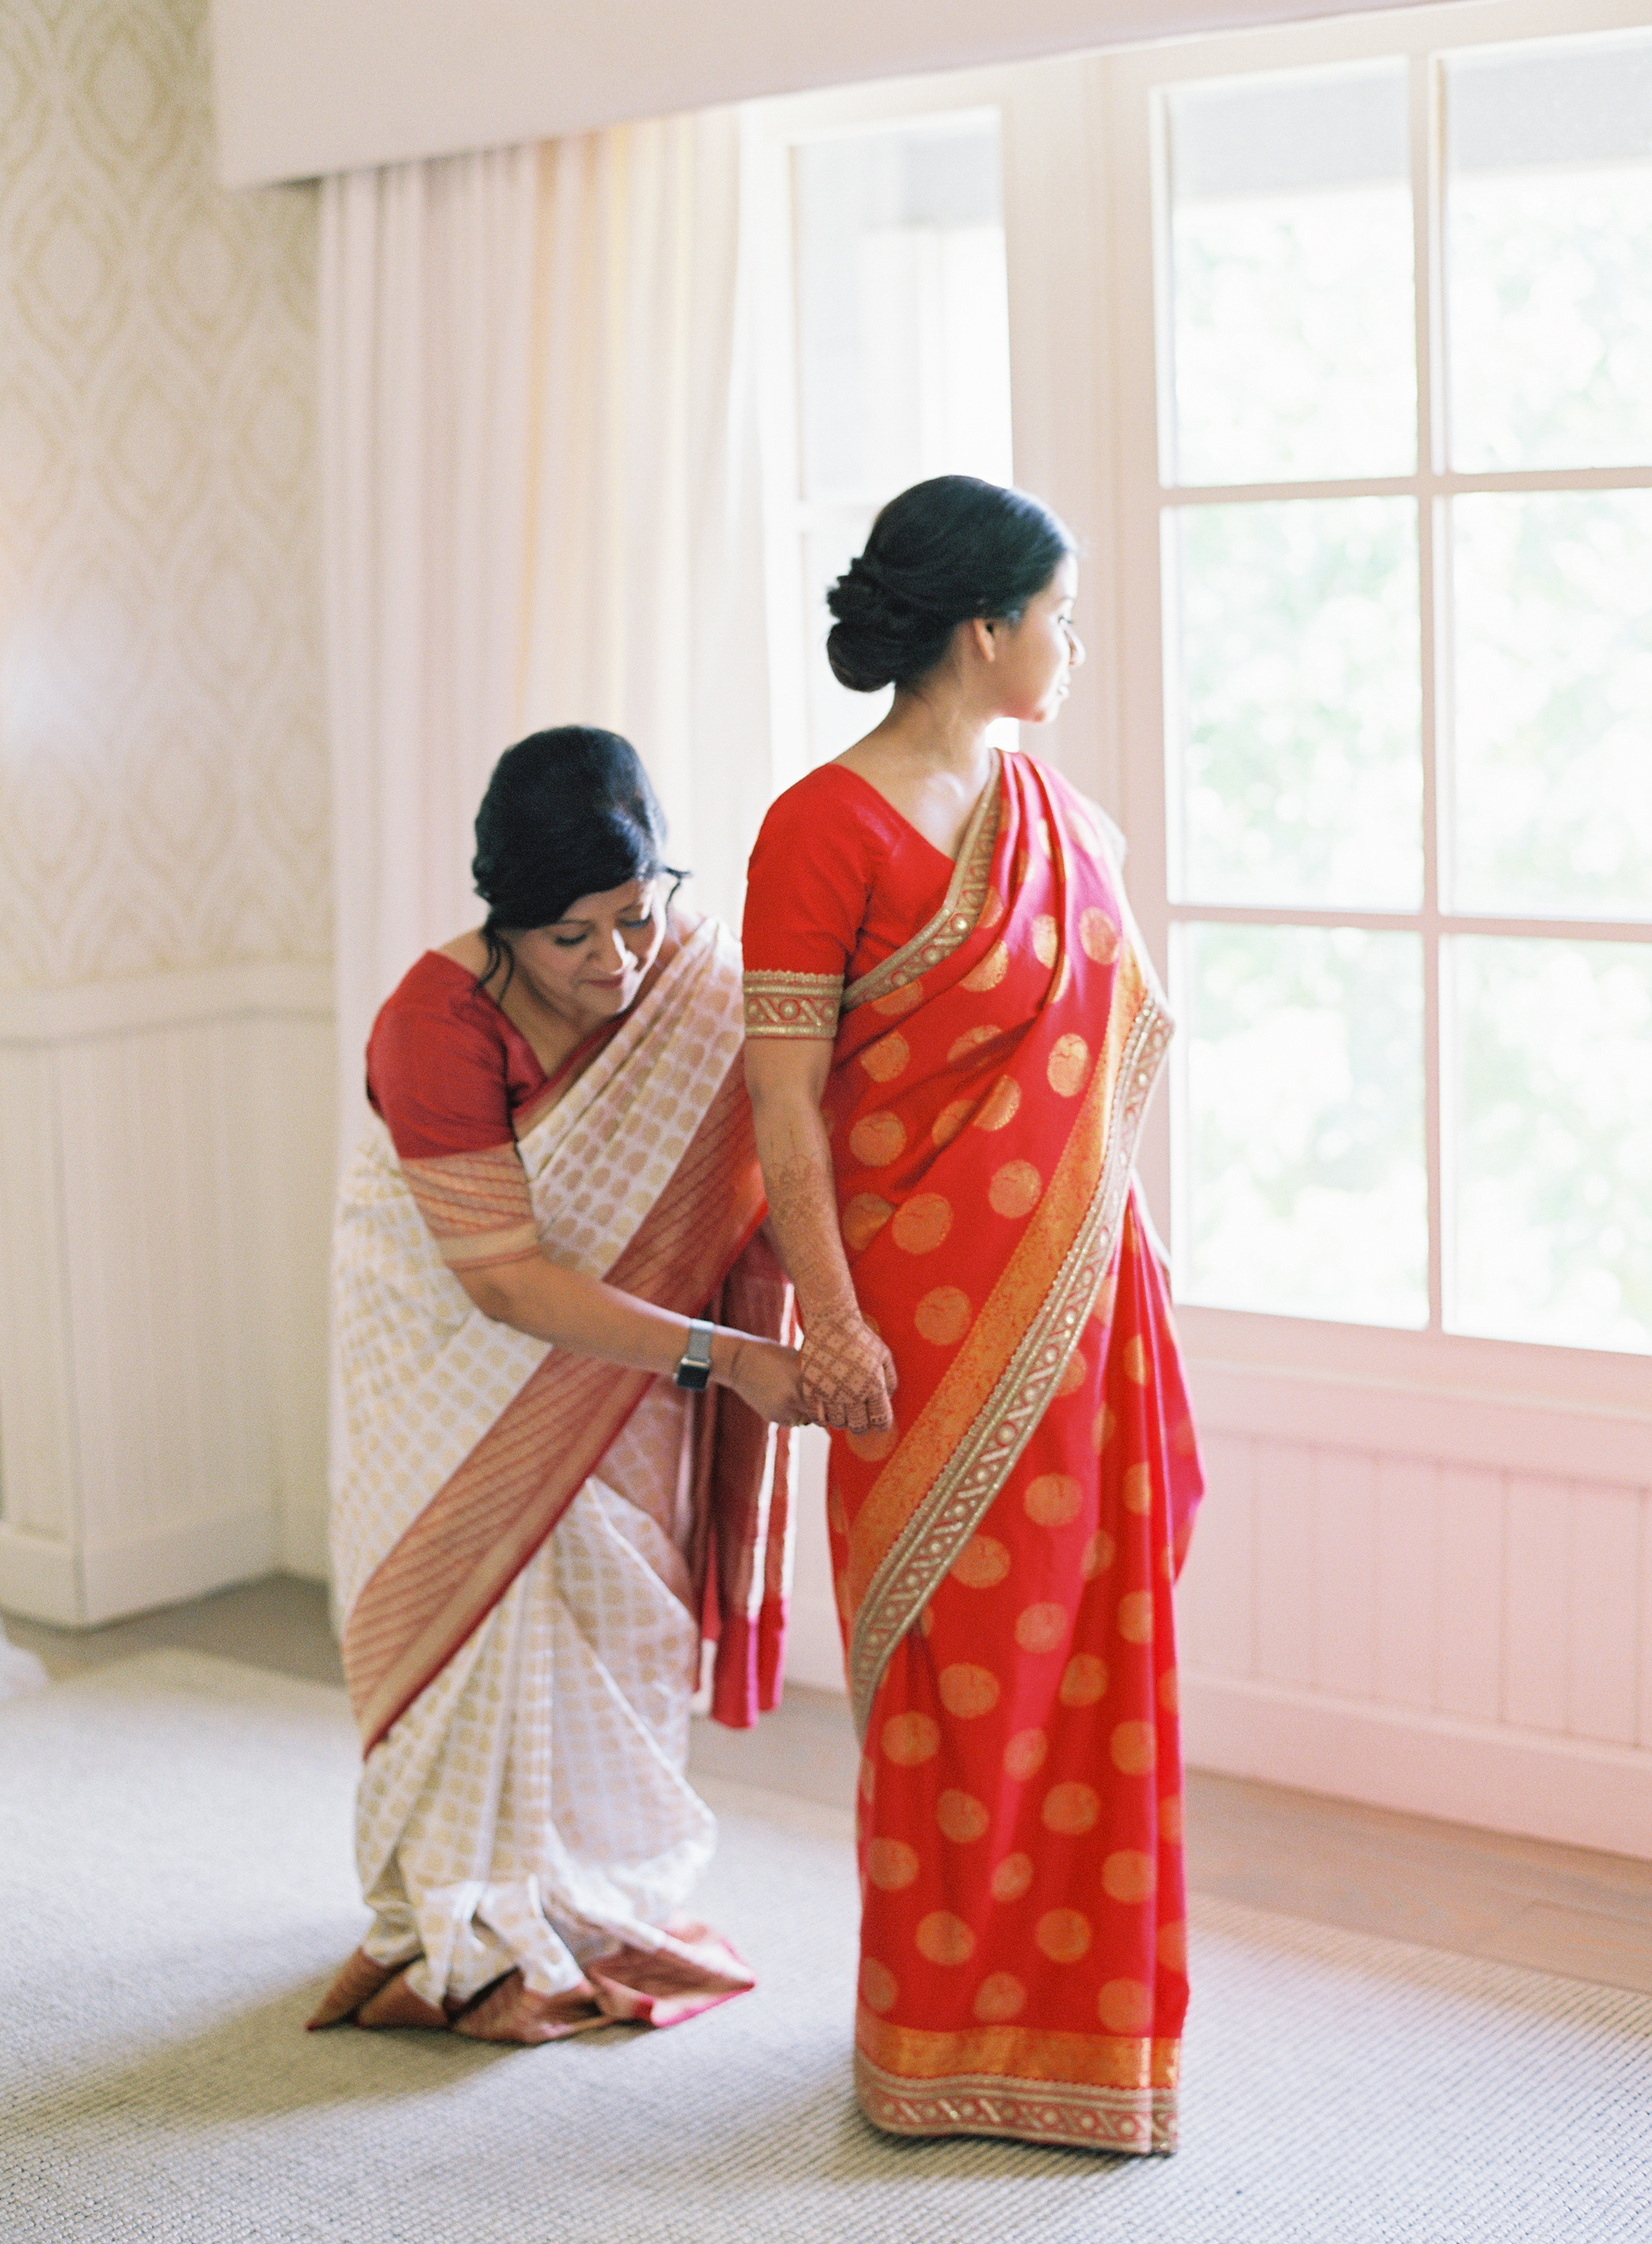 ronita ryan wedding bride in gown